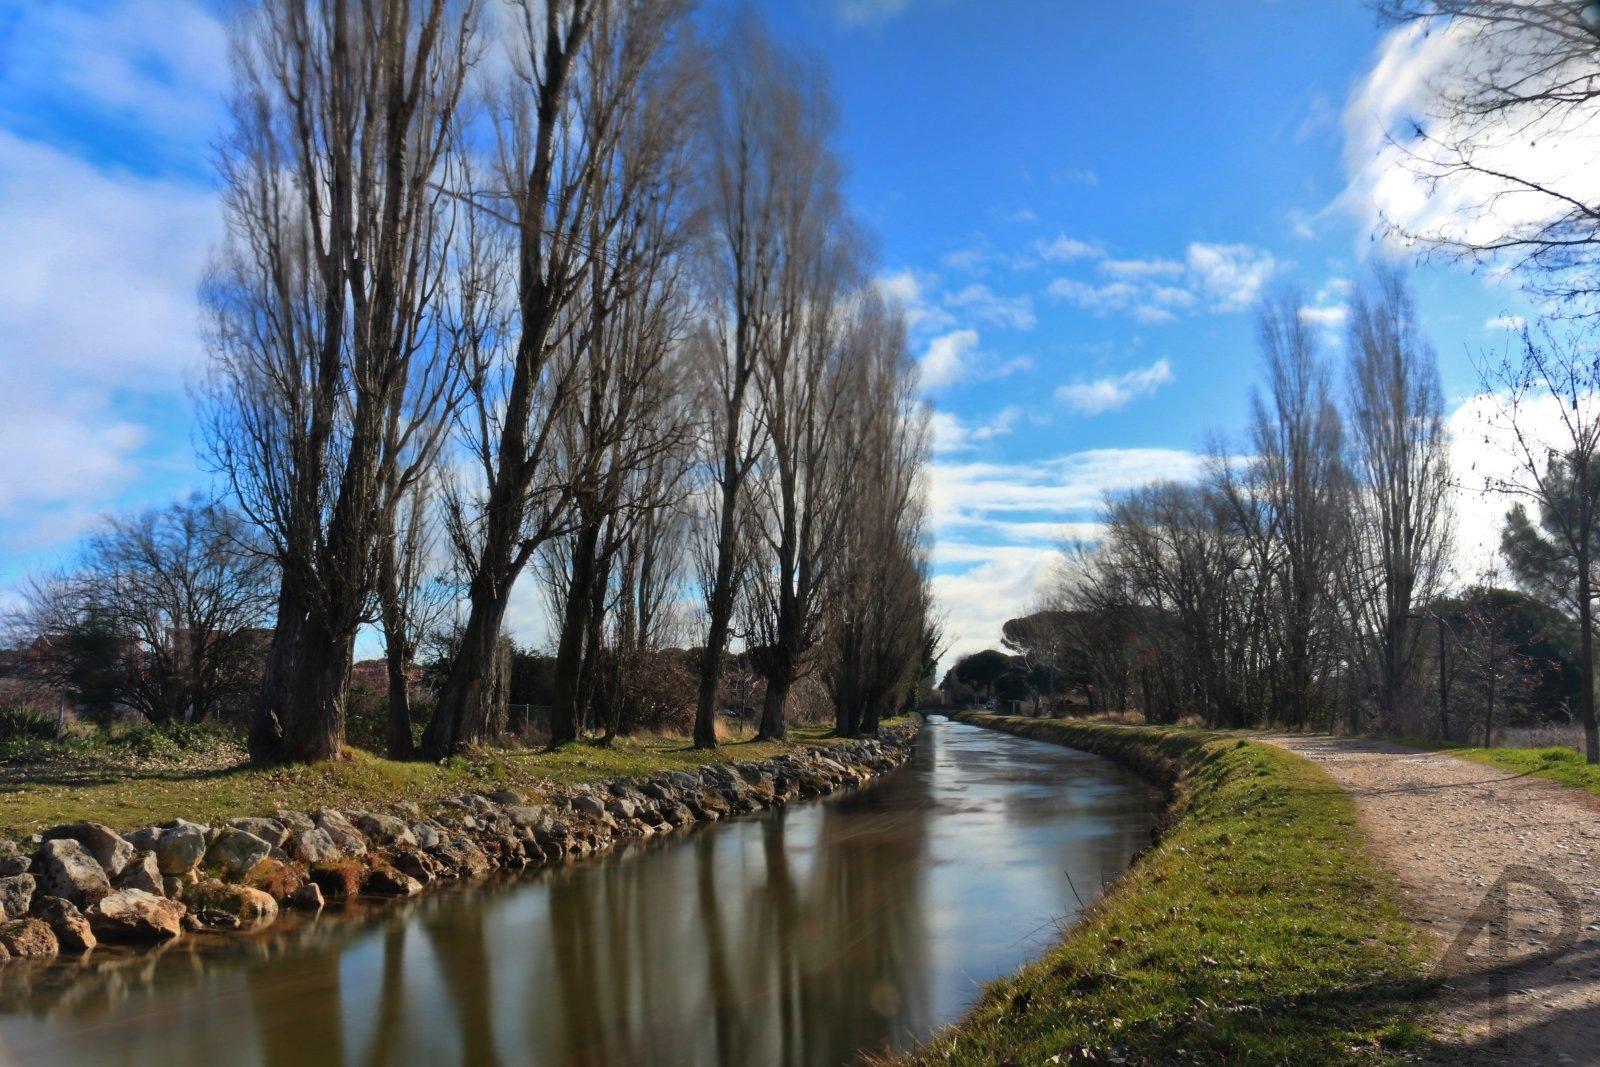 Canal del Duero by Arturo photography